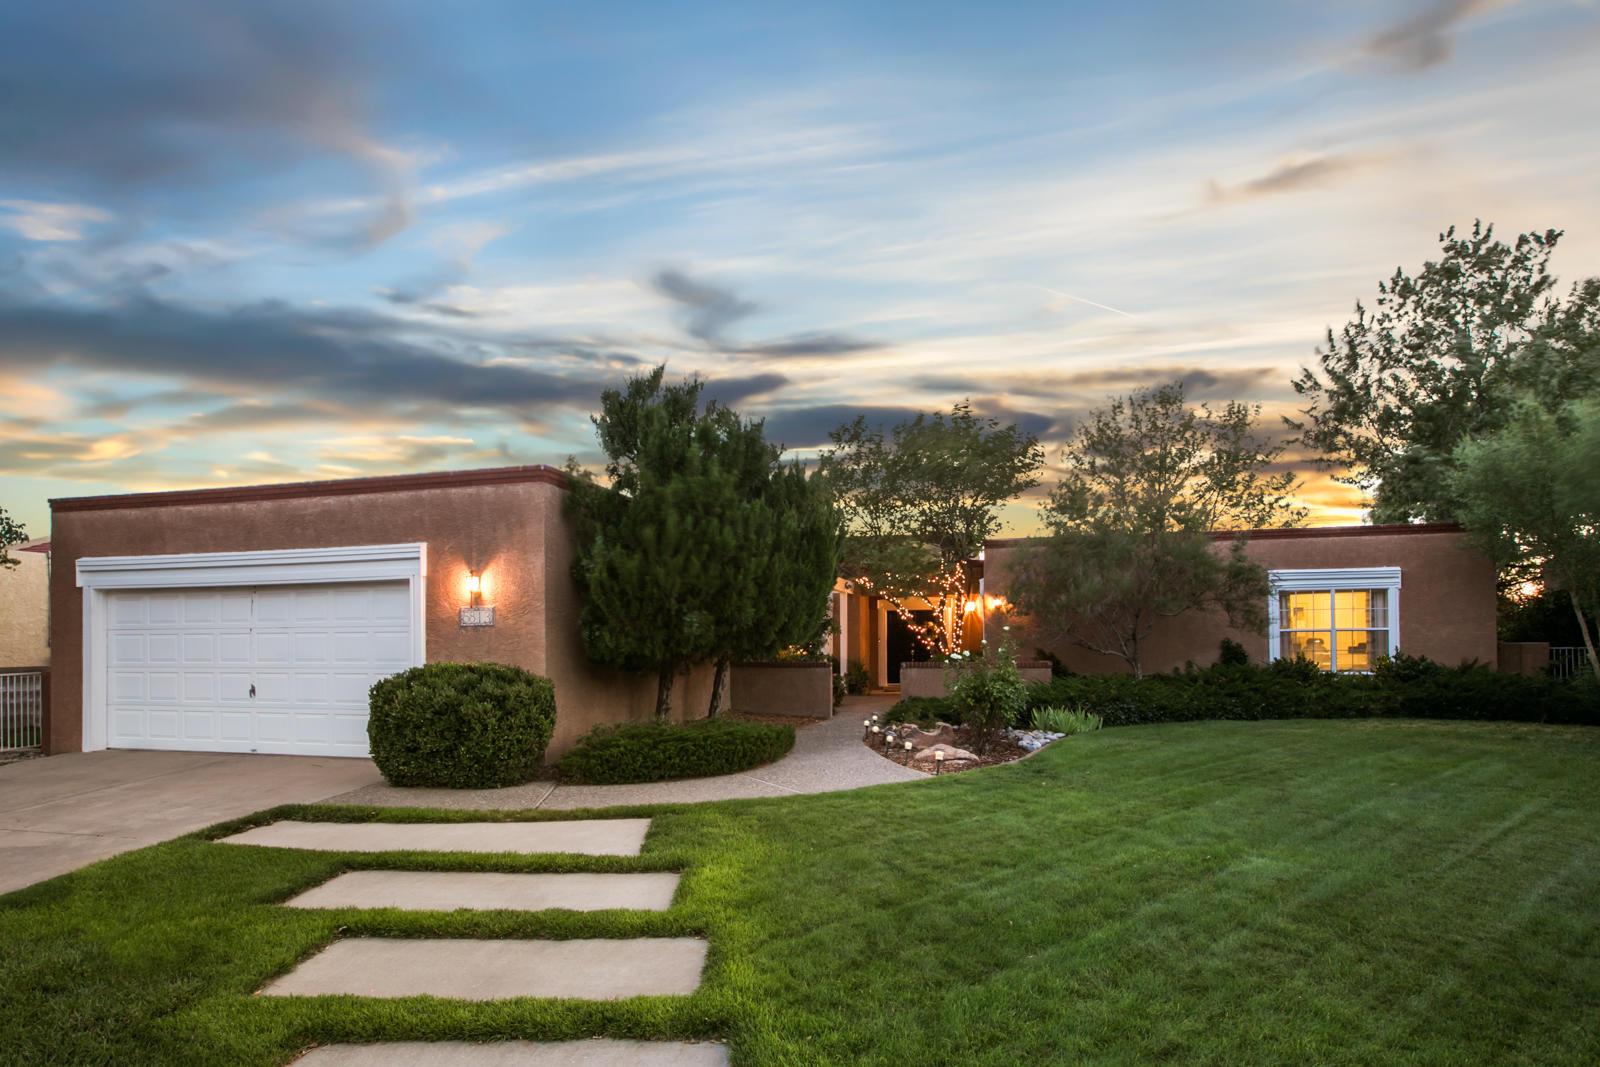 5813 Papaya,Albuquerque,New Mexico,United States 87111,4 Bedrooms Bedrooms,3 BathroomsBathrooms,Residential,Papaya,917289